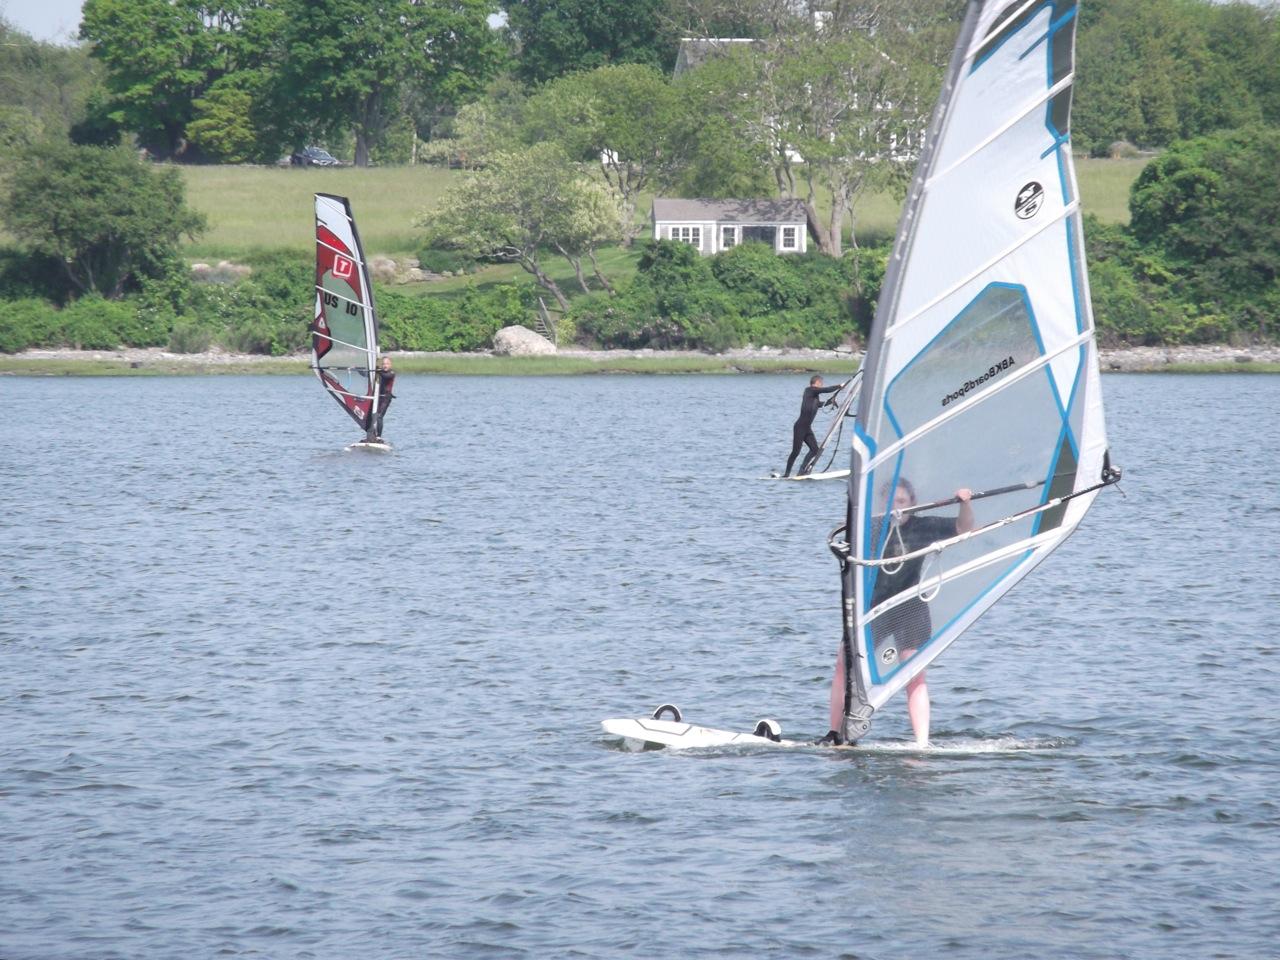 The Windsurf Loop: Light winds & longboards